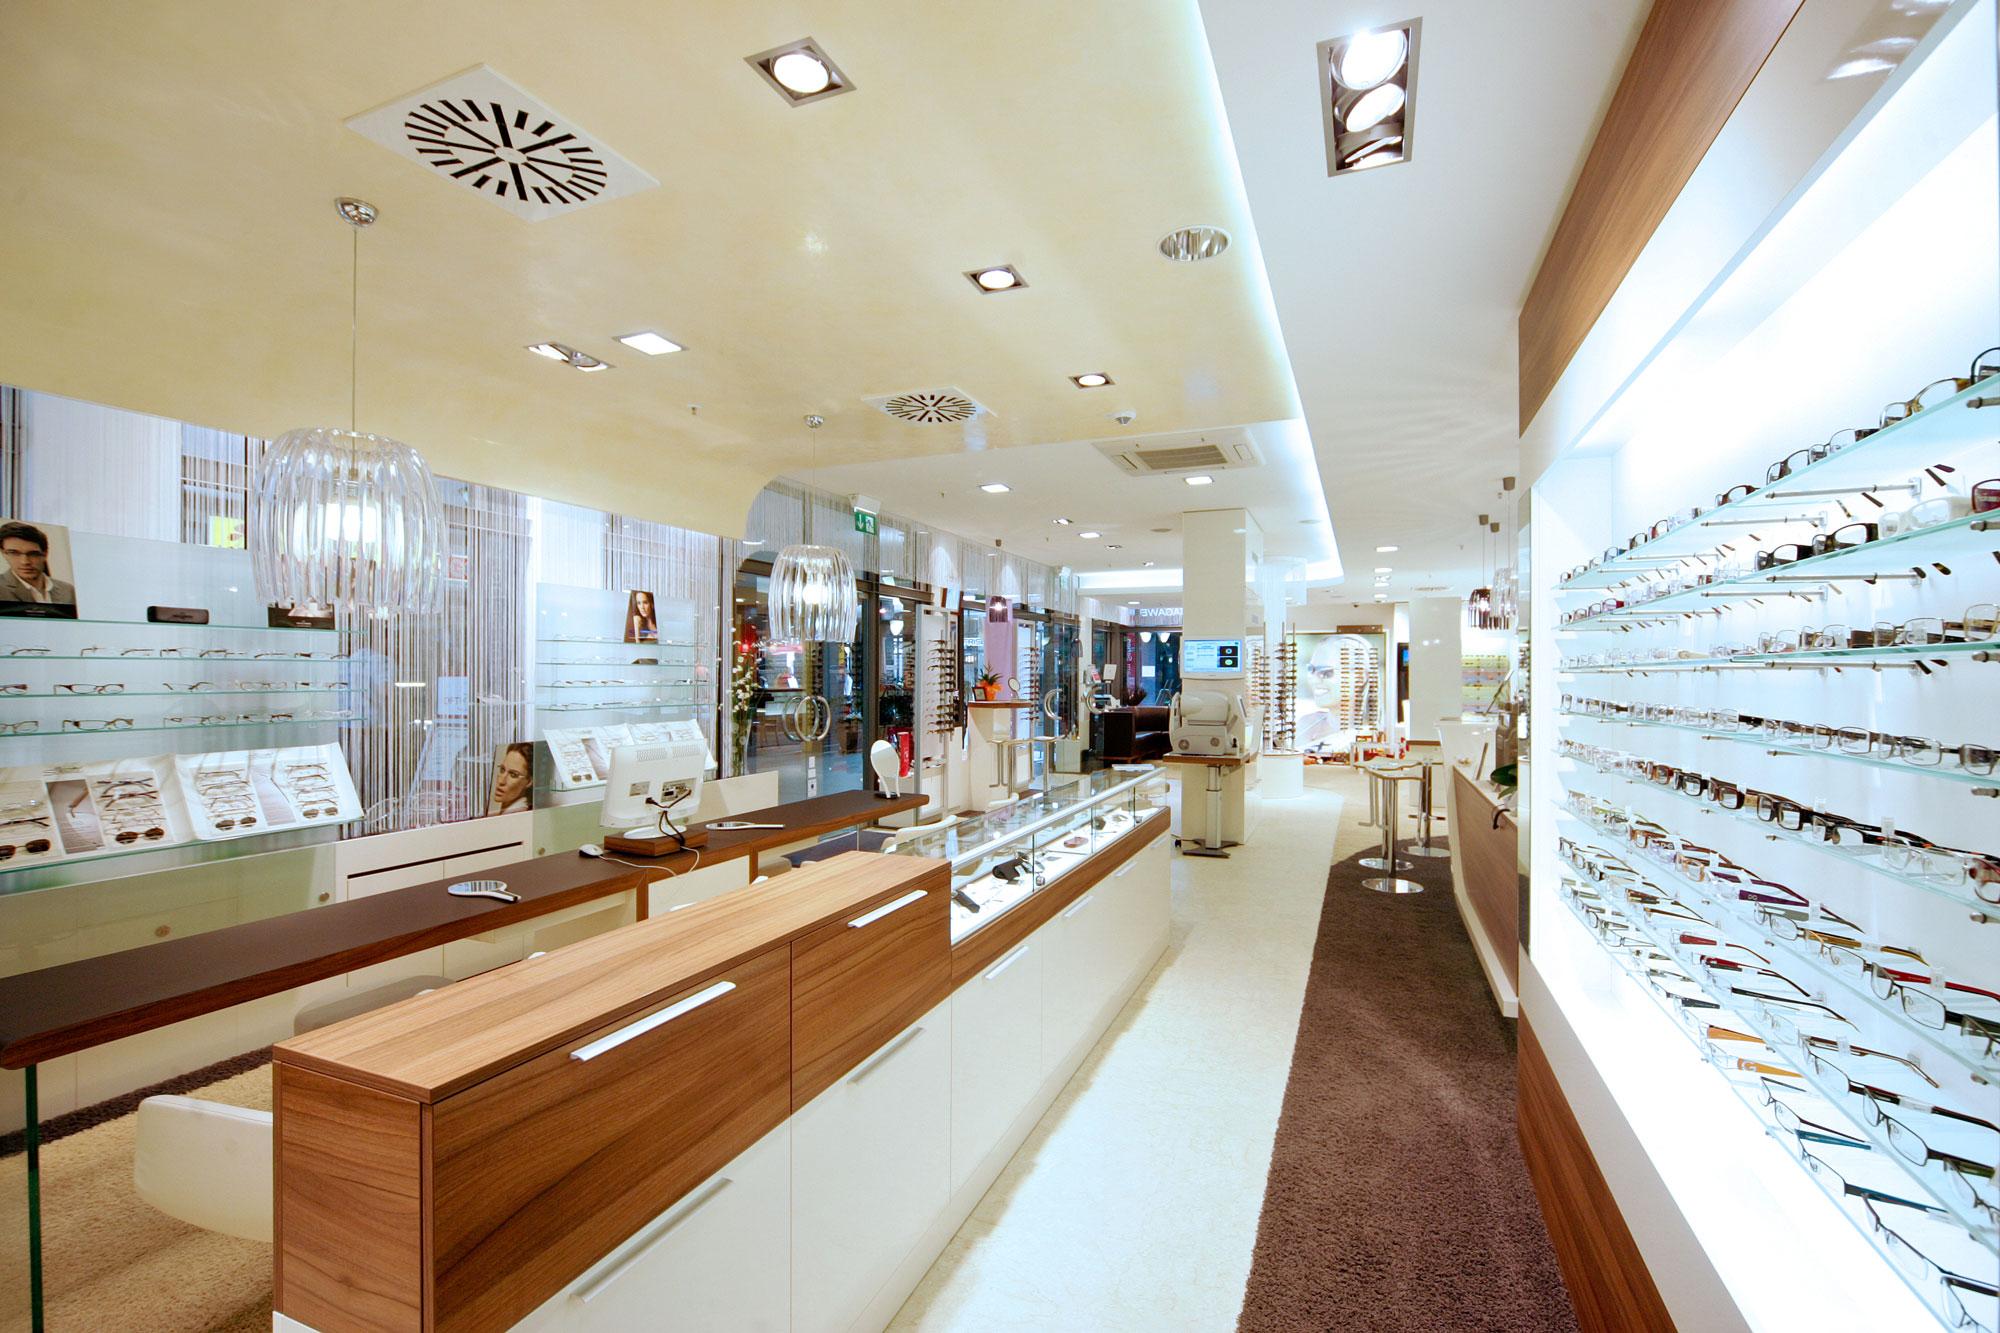 Optik Sagawe im Doberaner Hof - Blick in den Laden - ist das Zeiss Vision Center in Rostock